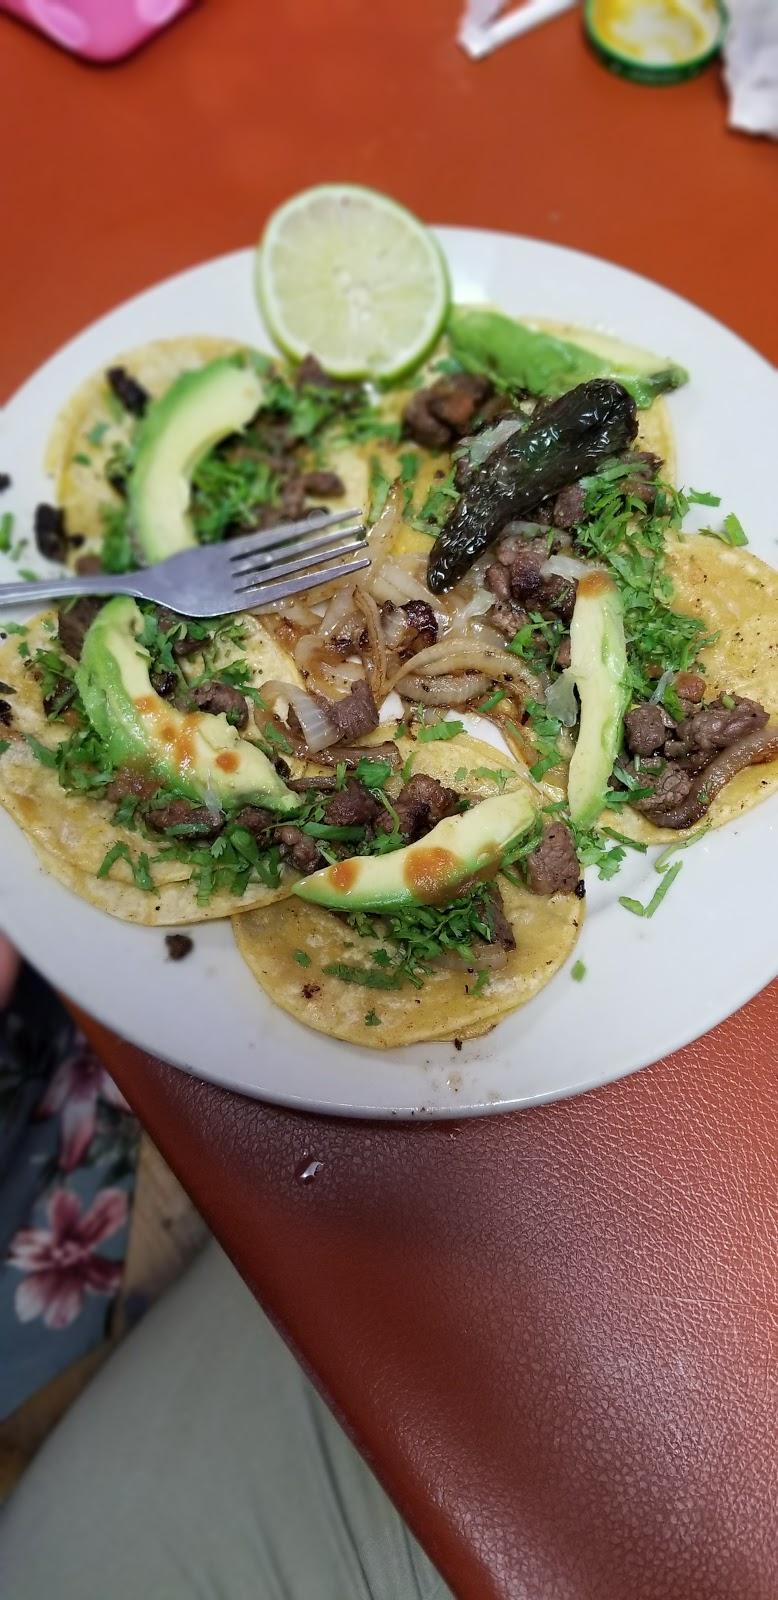 El Corral Tex-Mex Restaurant - restaurant  | Photo 2 of 10 | Address: 1415 N 14th St, Kingsville, TX 78363, USA | Phone: (361) 592-1574